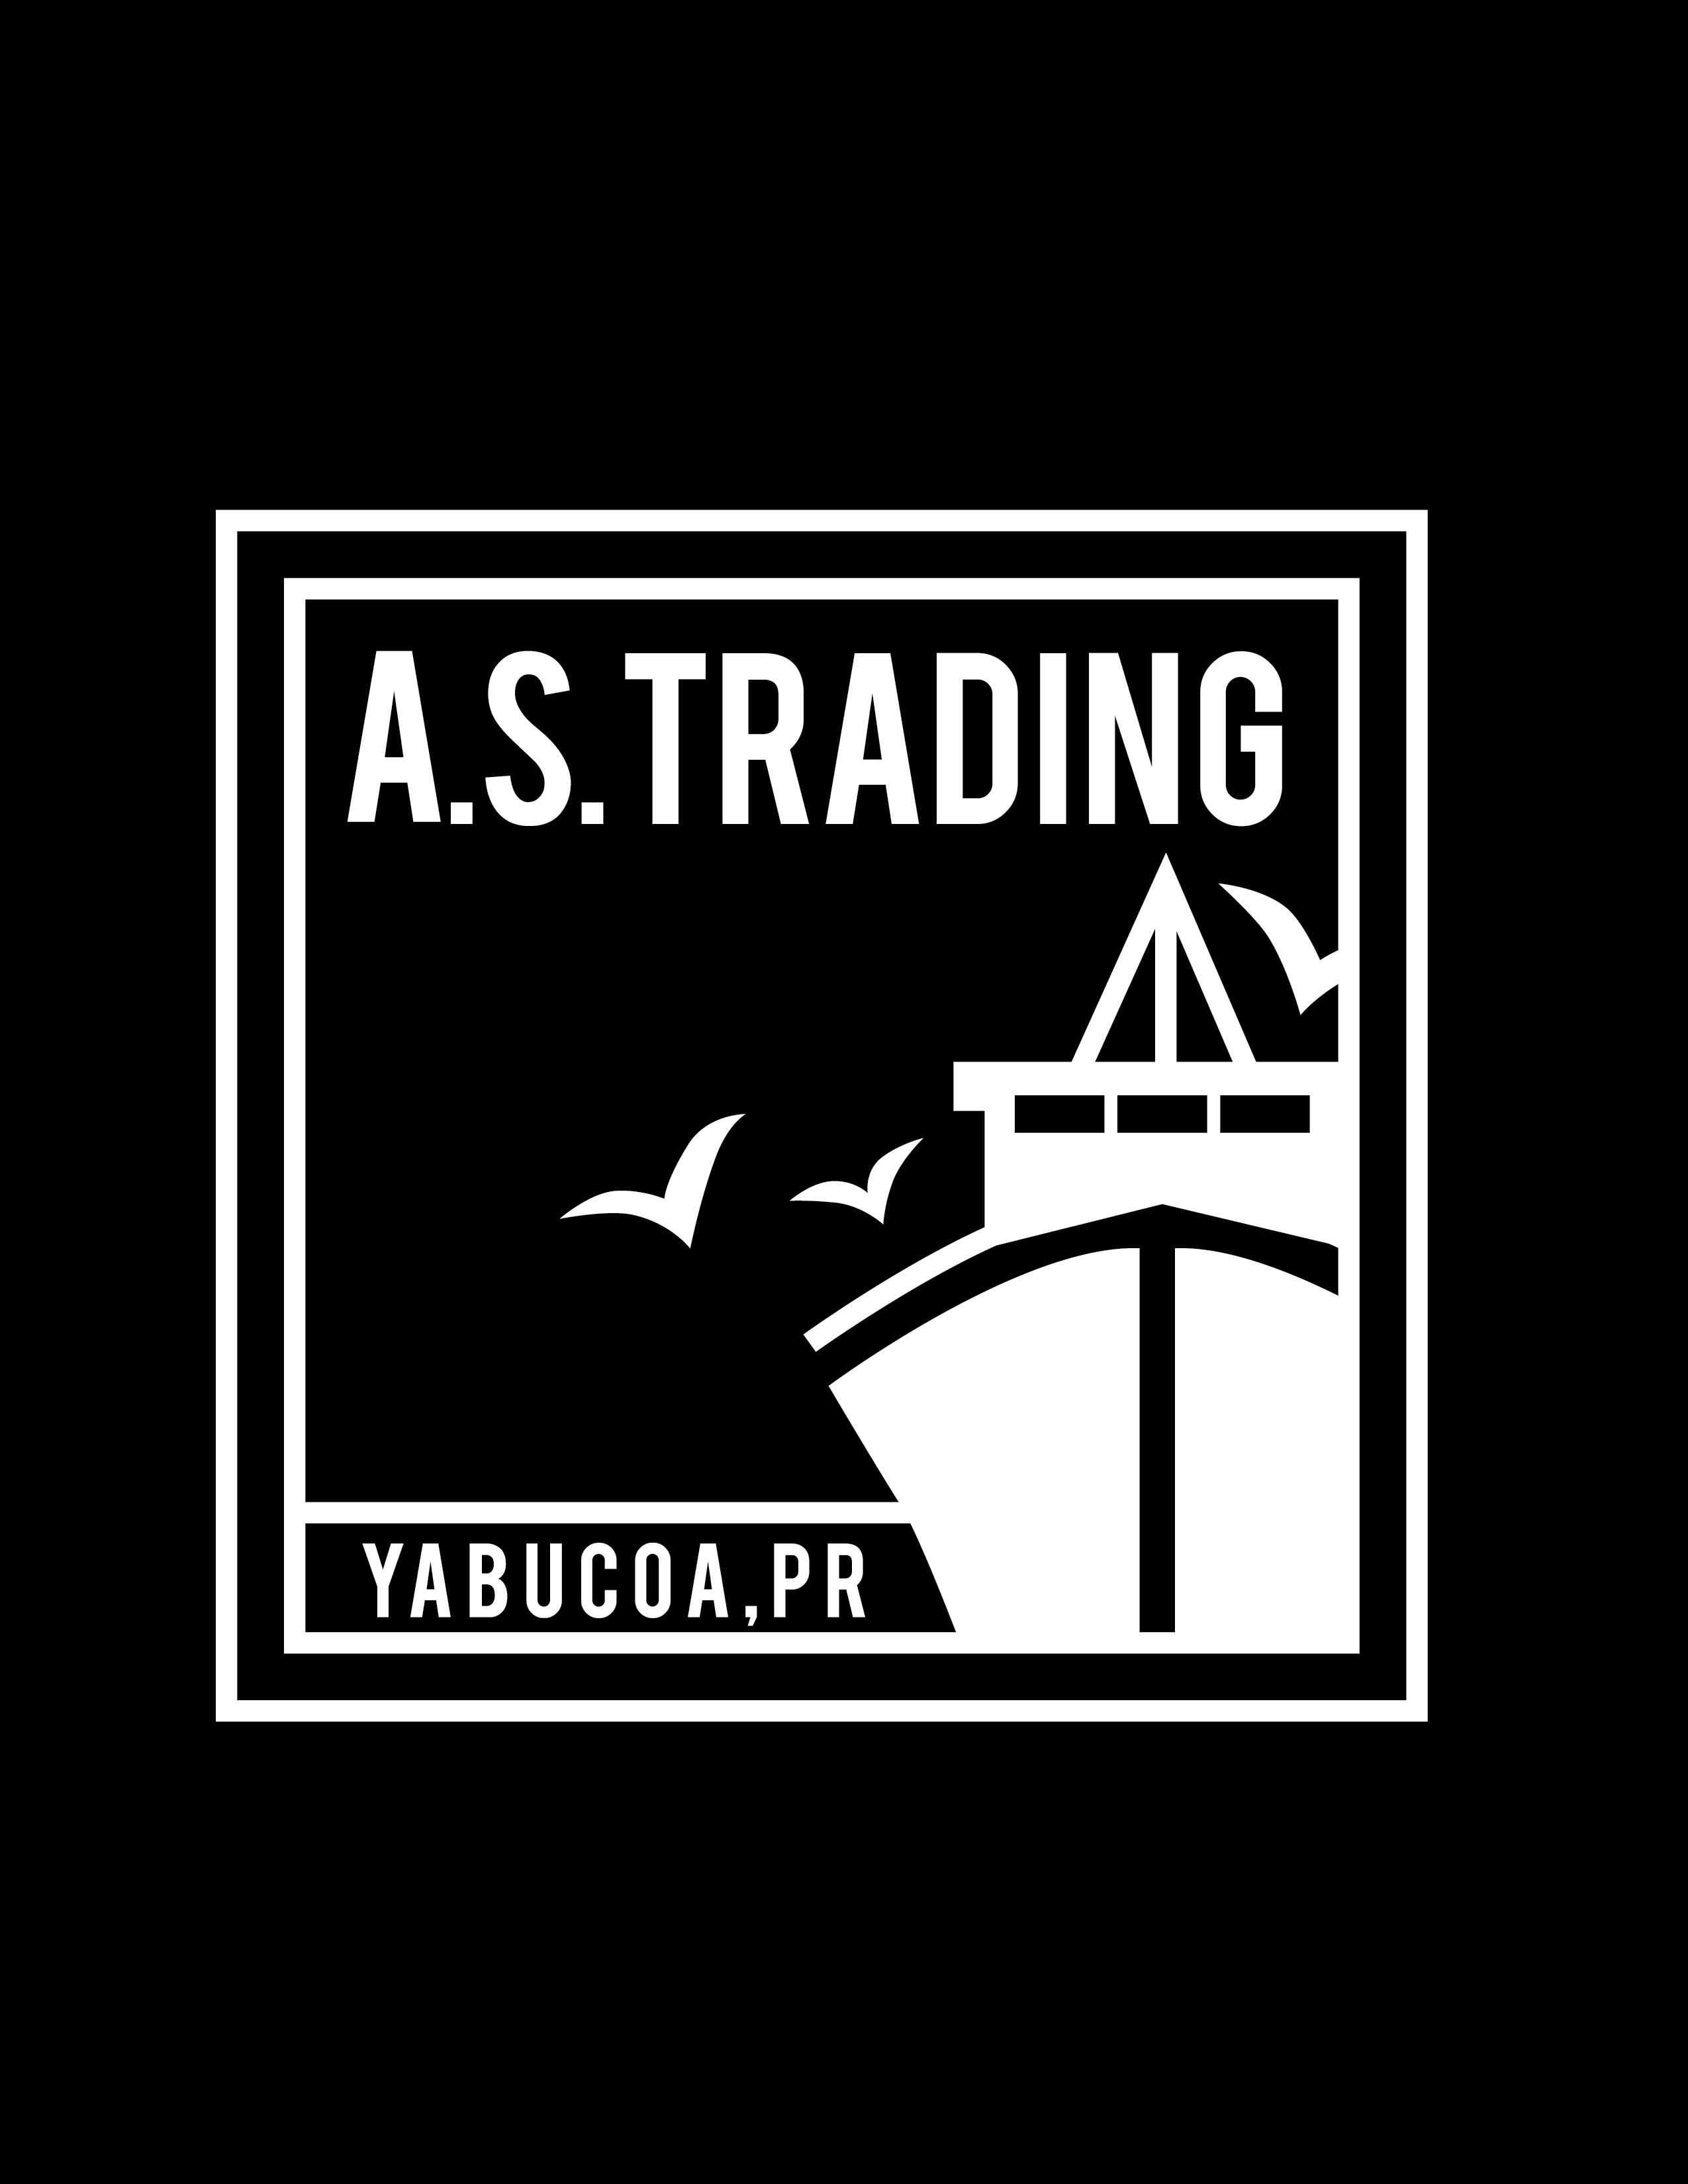 A.S. Trading, LLC